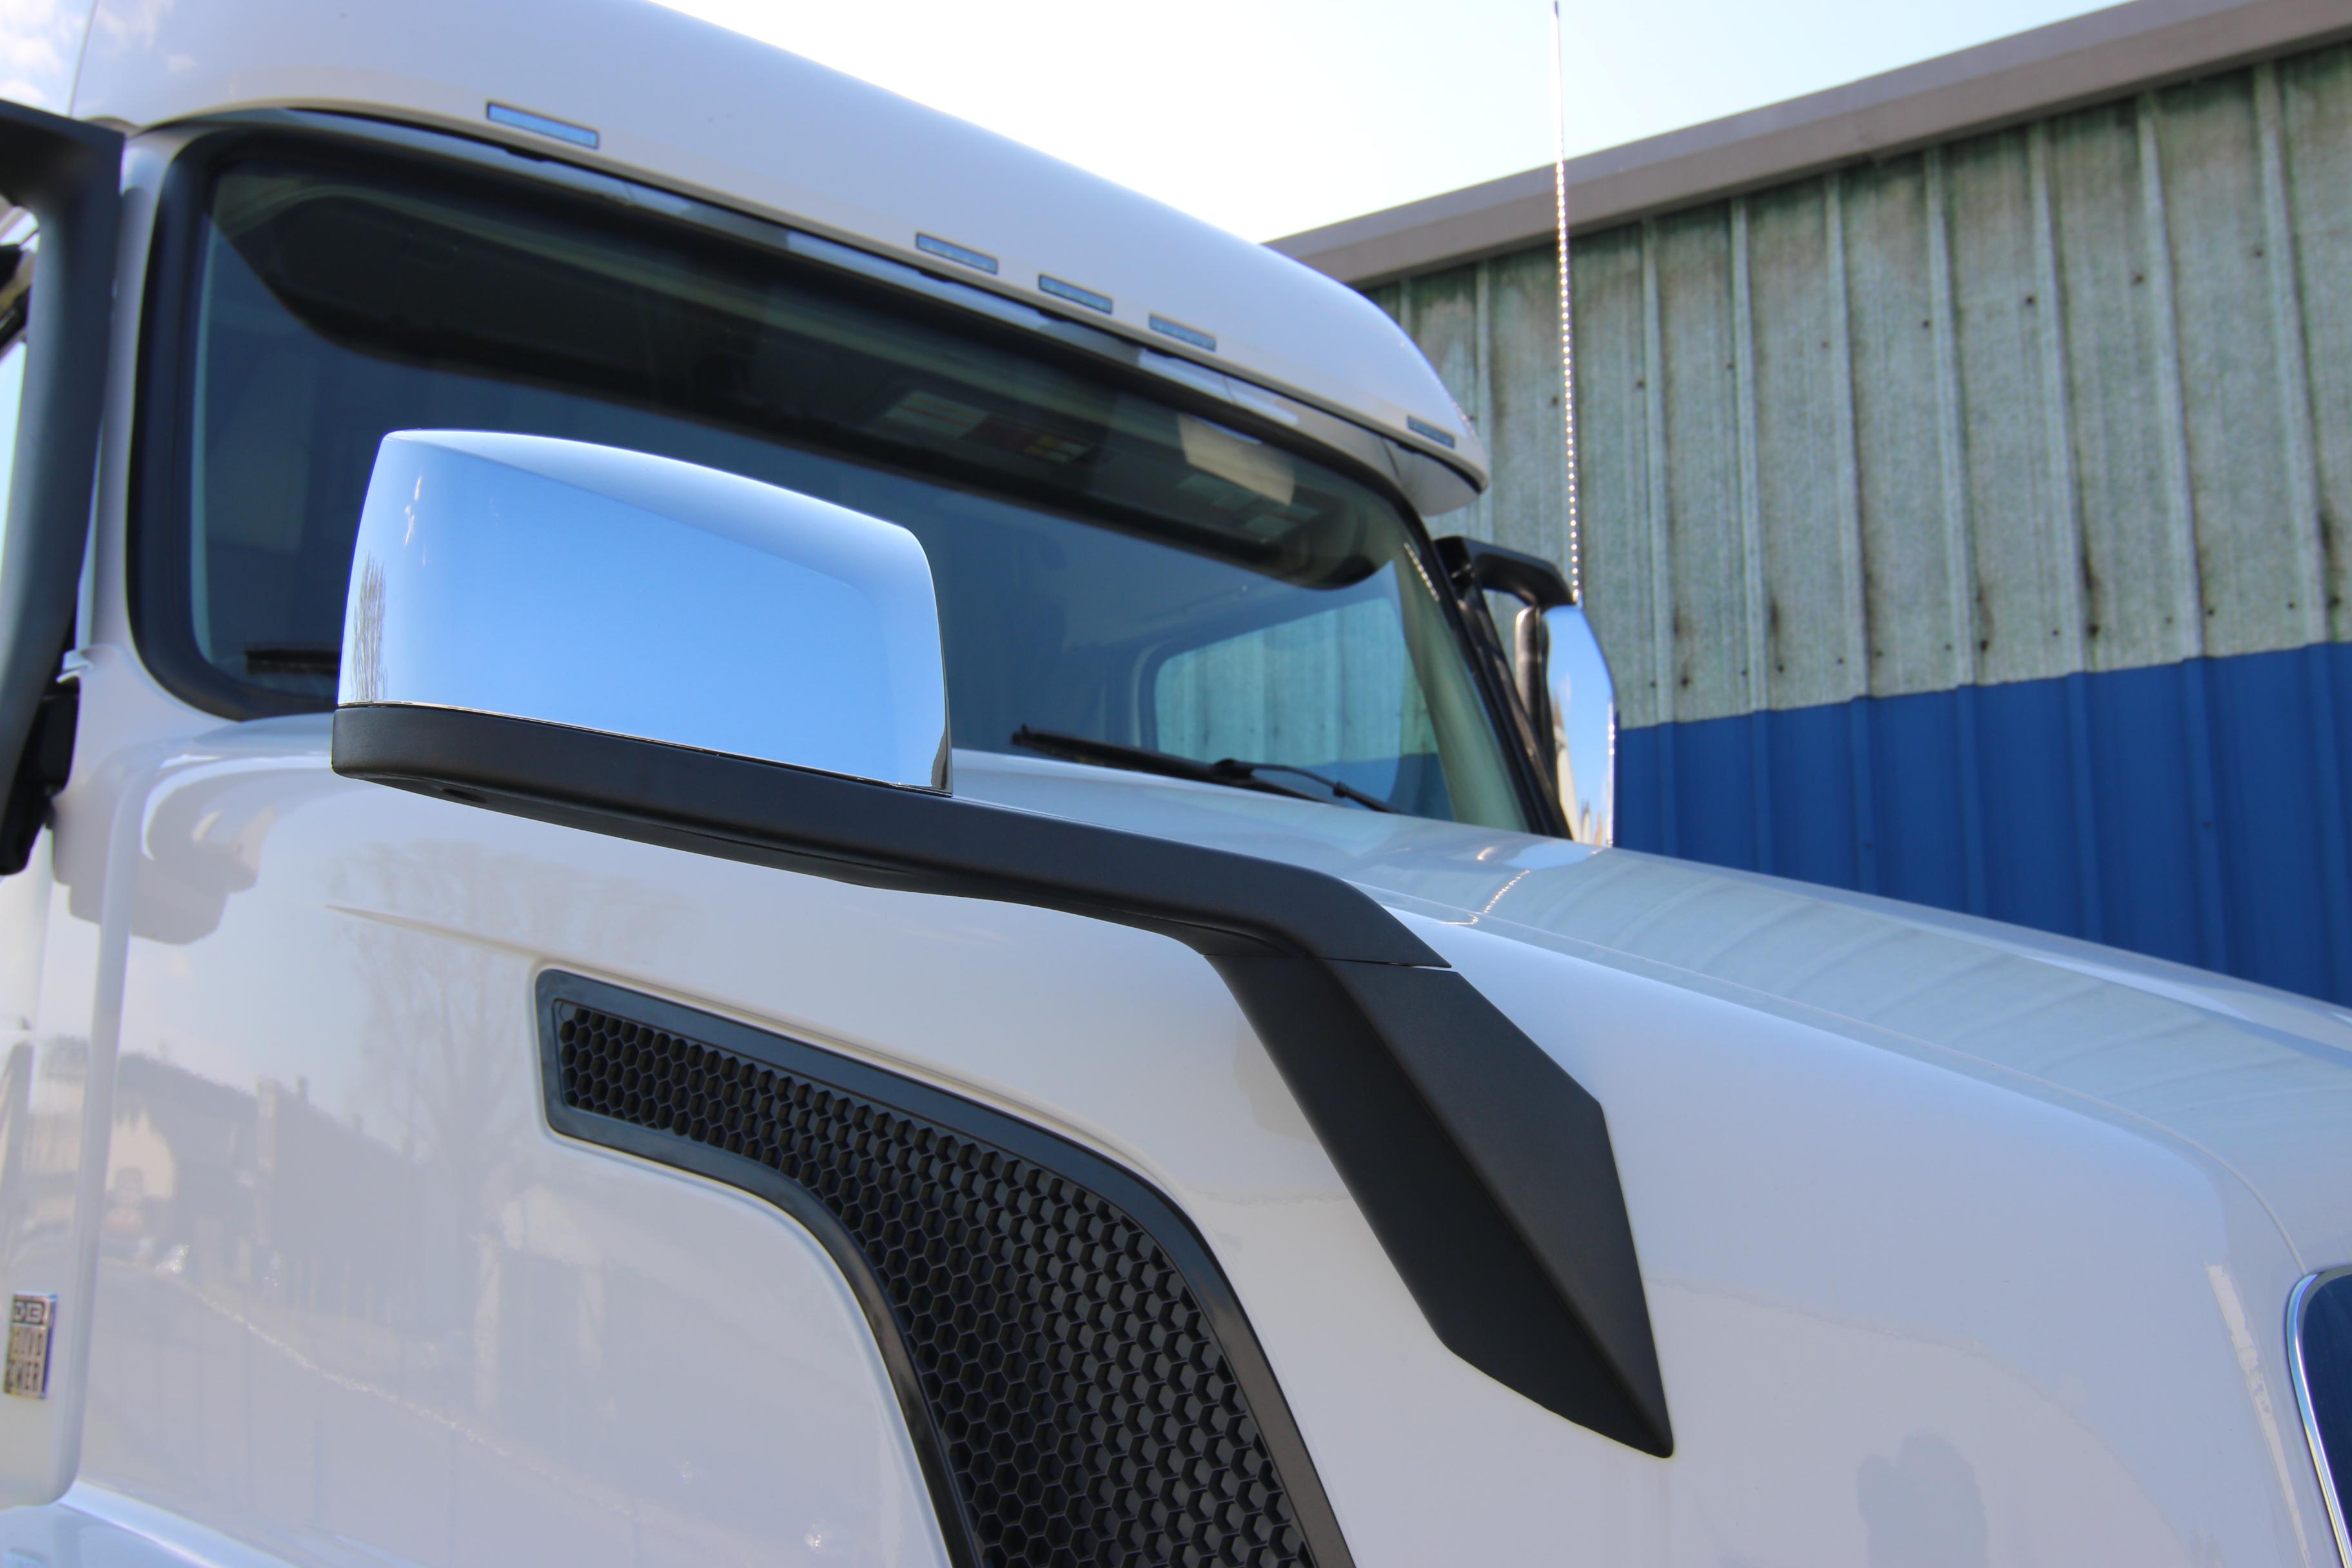 2017 Volvo Truck VNL670 Tandem Axle Sleeper New Truck for Sale ...